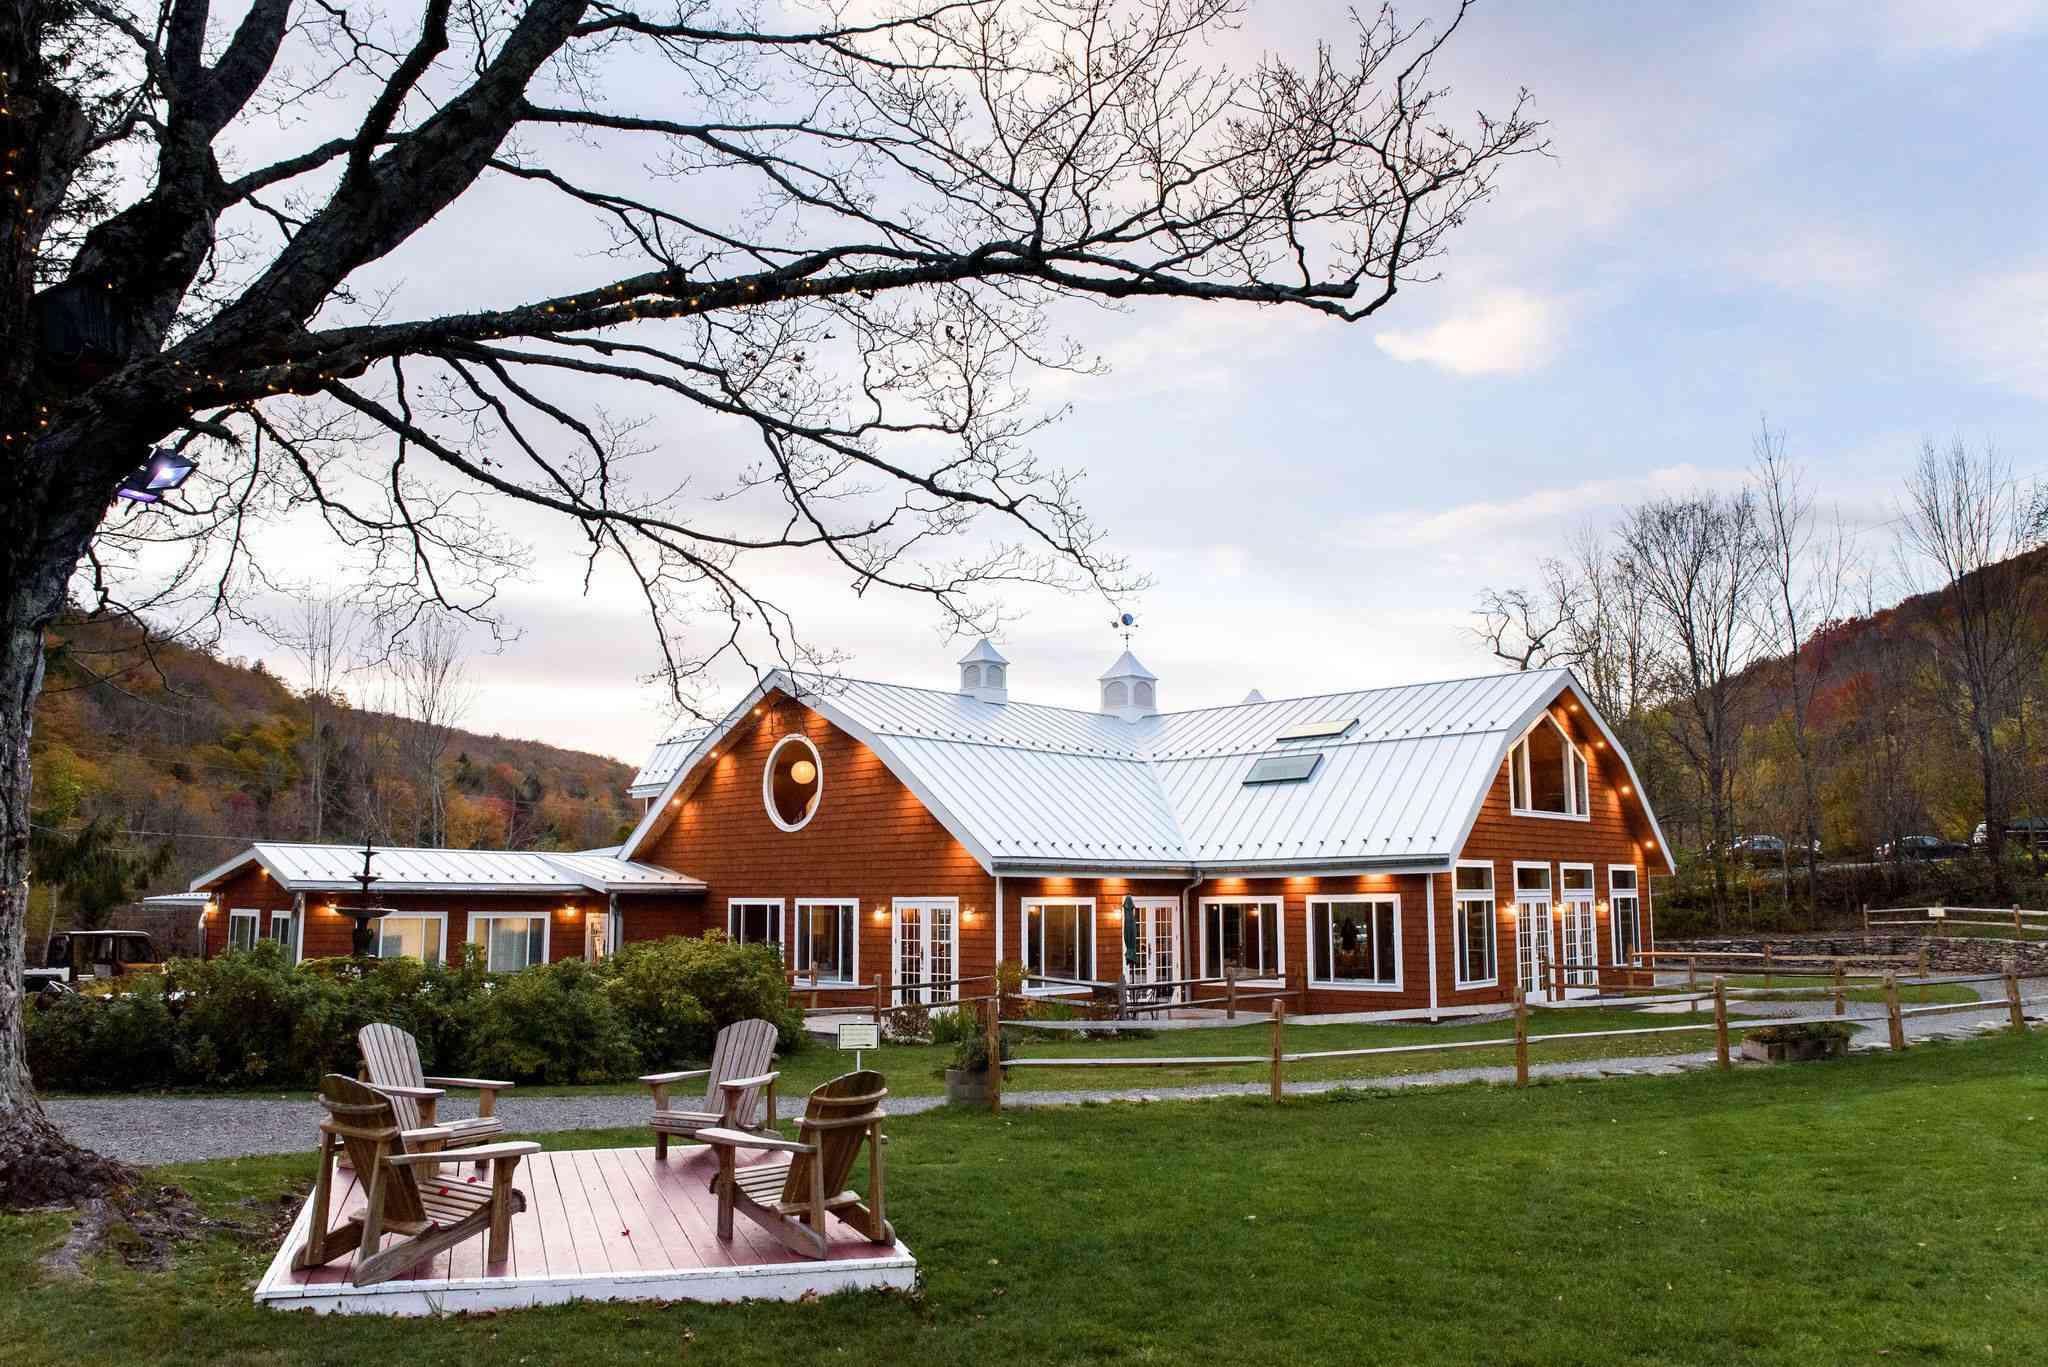 The Moondance Pavilion at Full Moon Resort